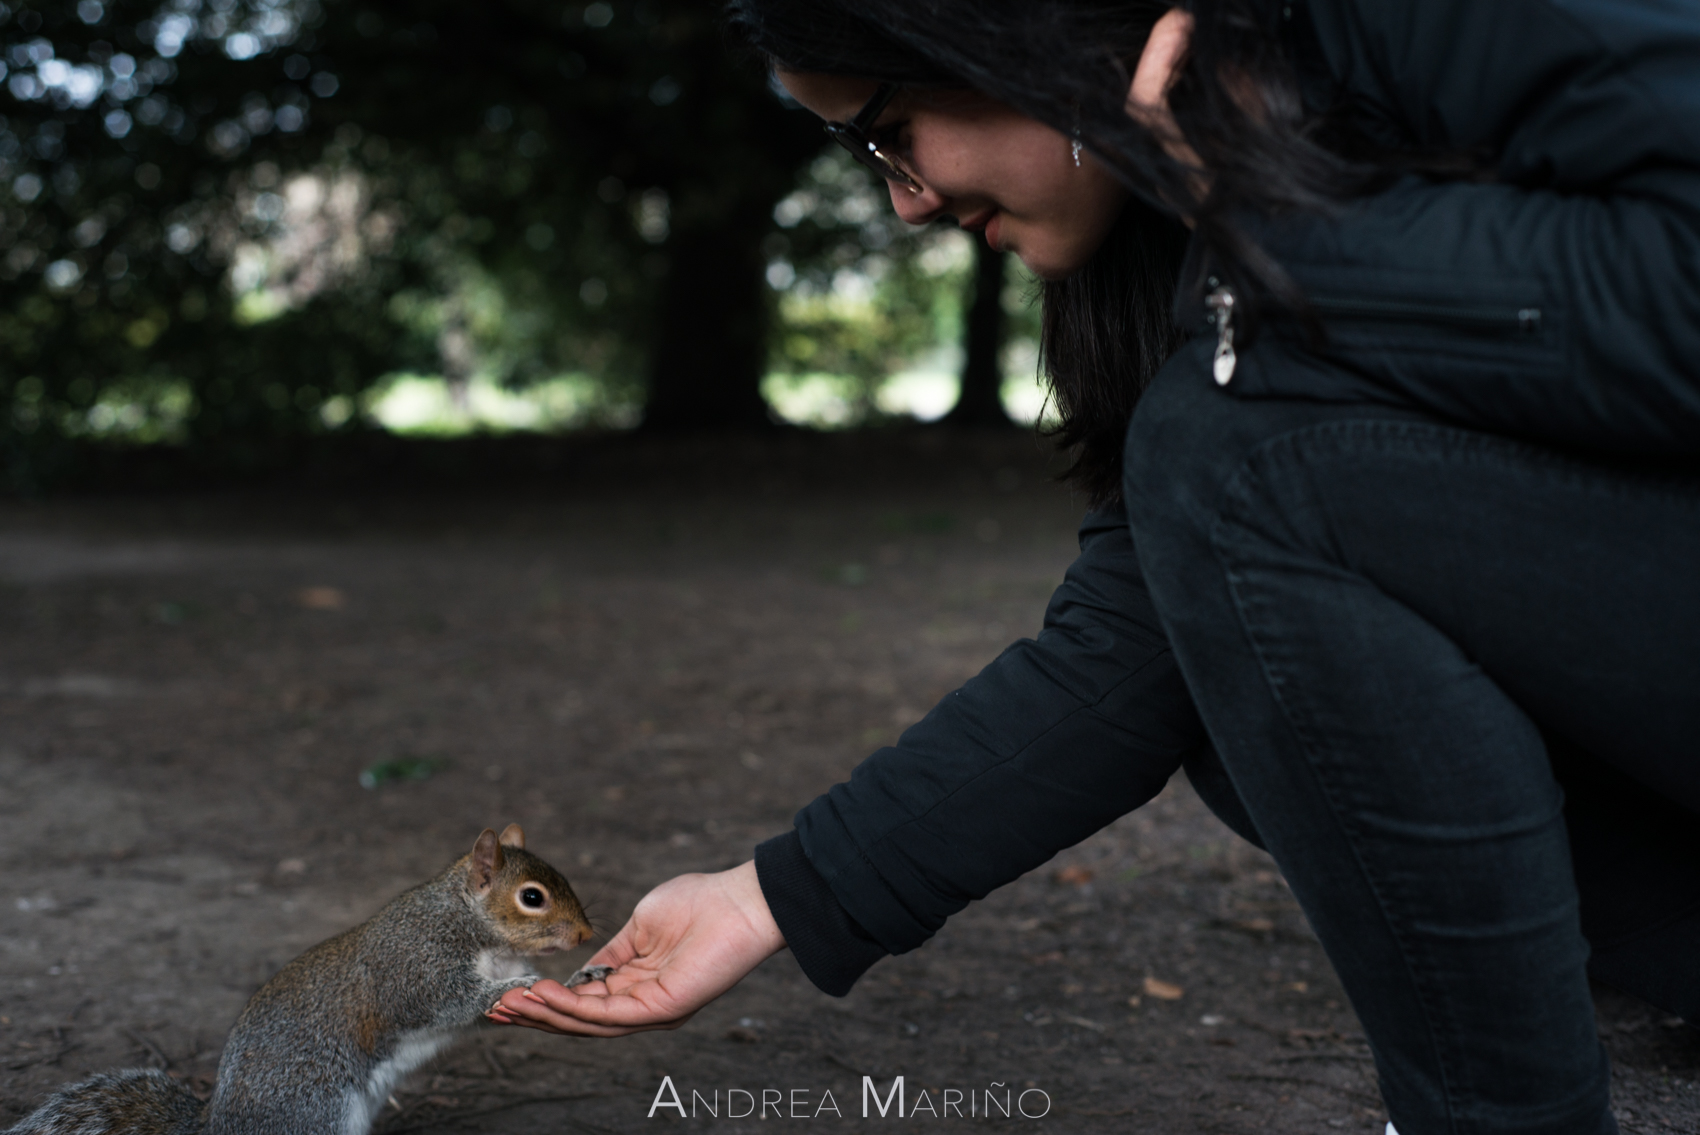 Andrea Mariño. Londres riquiñez. 2016